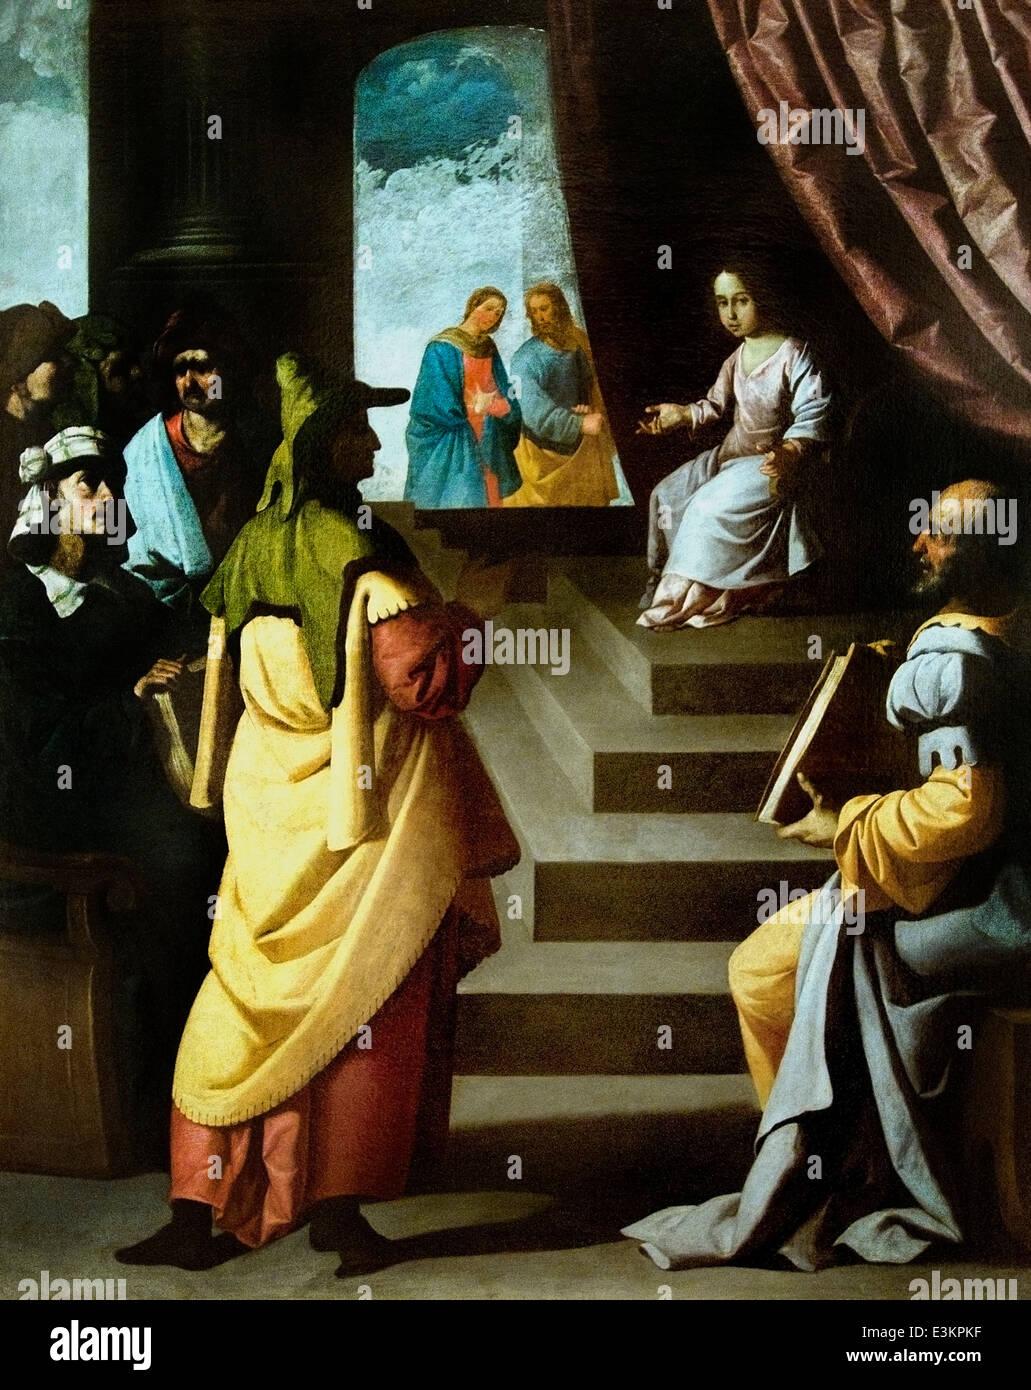 Jesus among the Doctors 1629 Zurbarán, Francisco de 1598 -1664 Spain Spanish - Stock Image